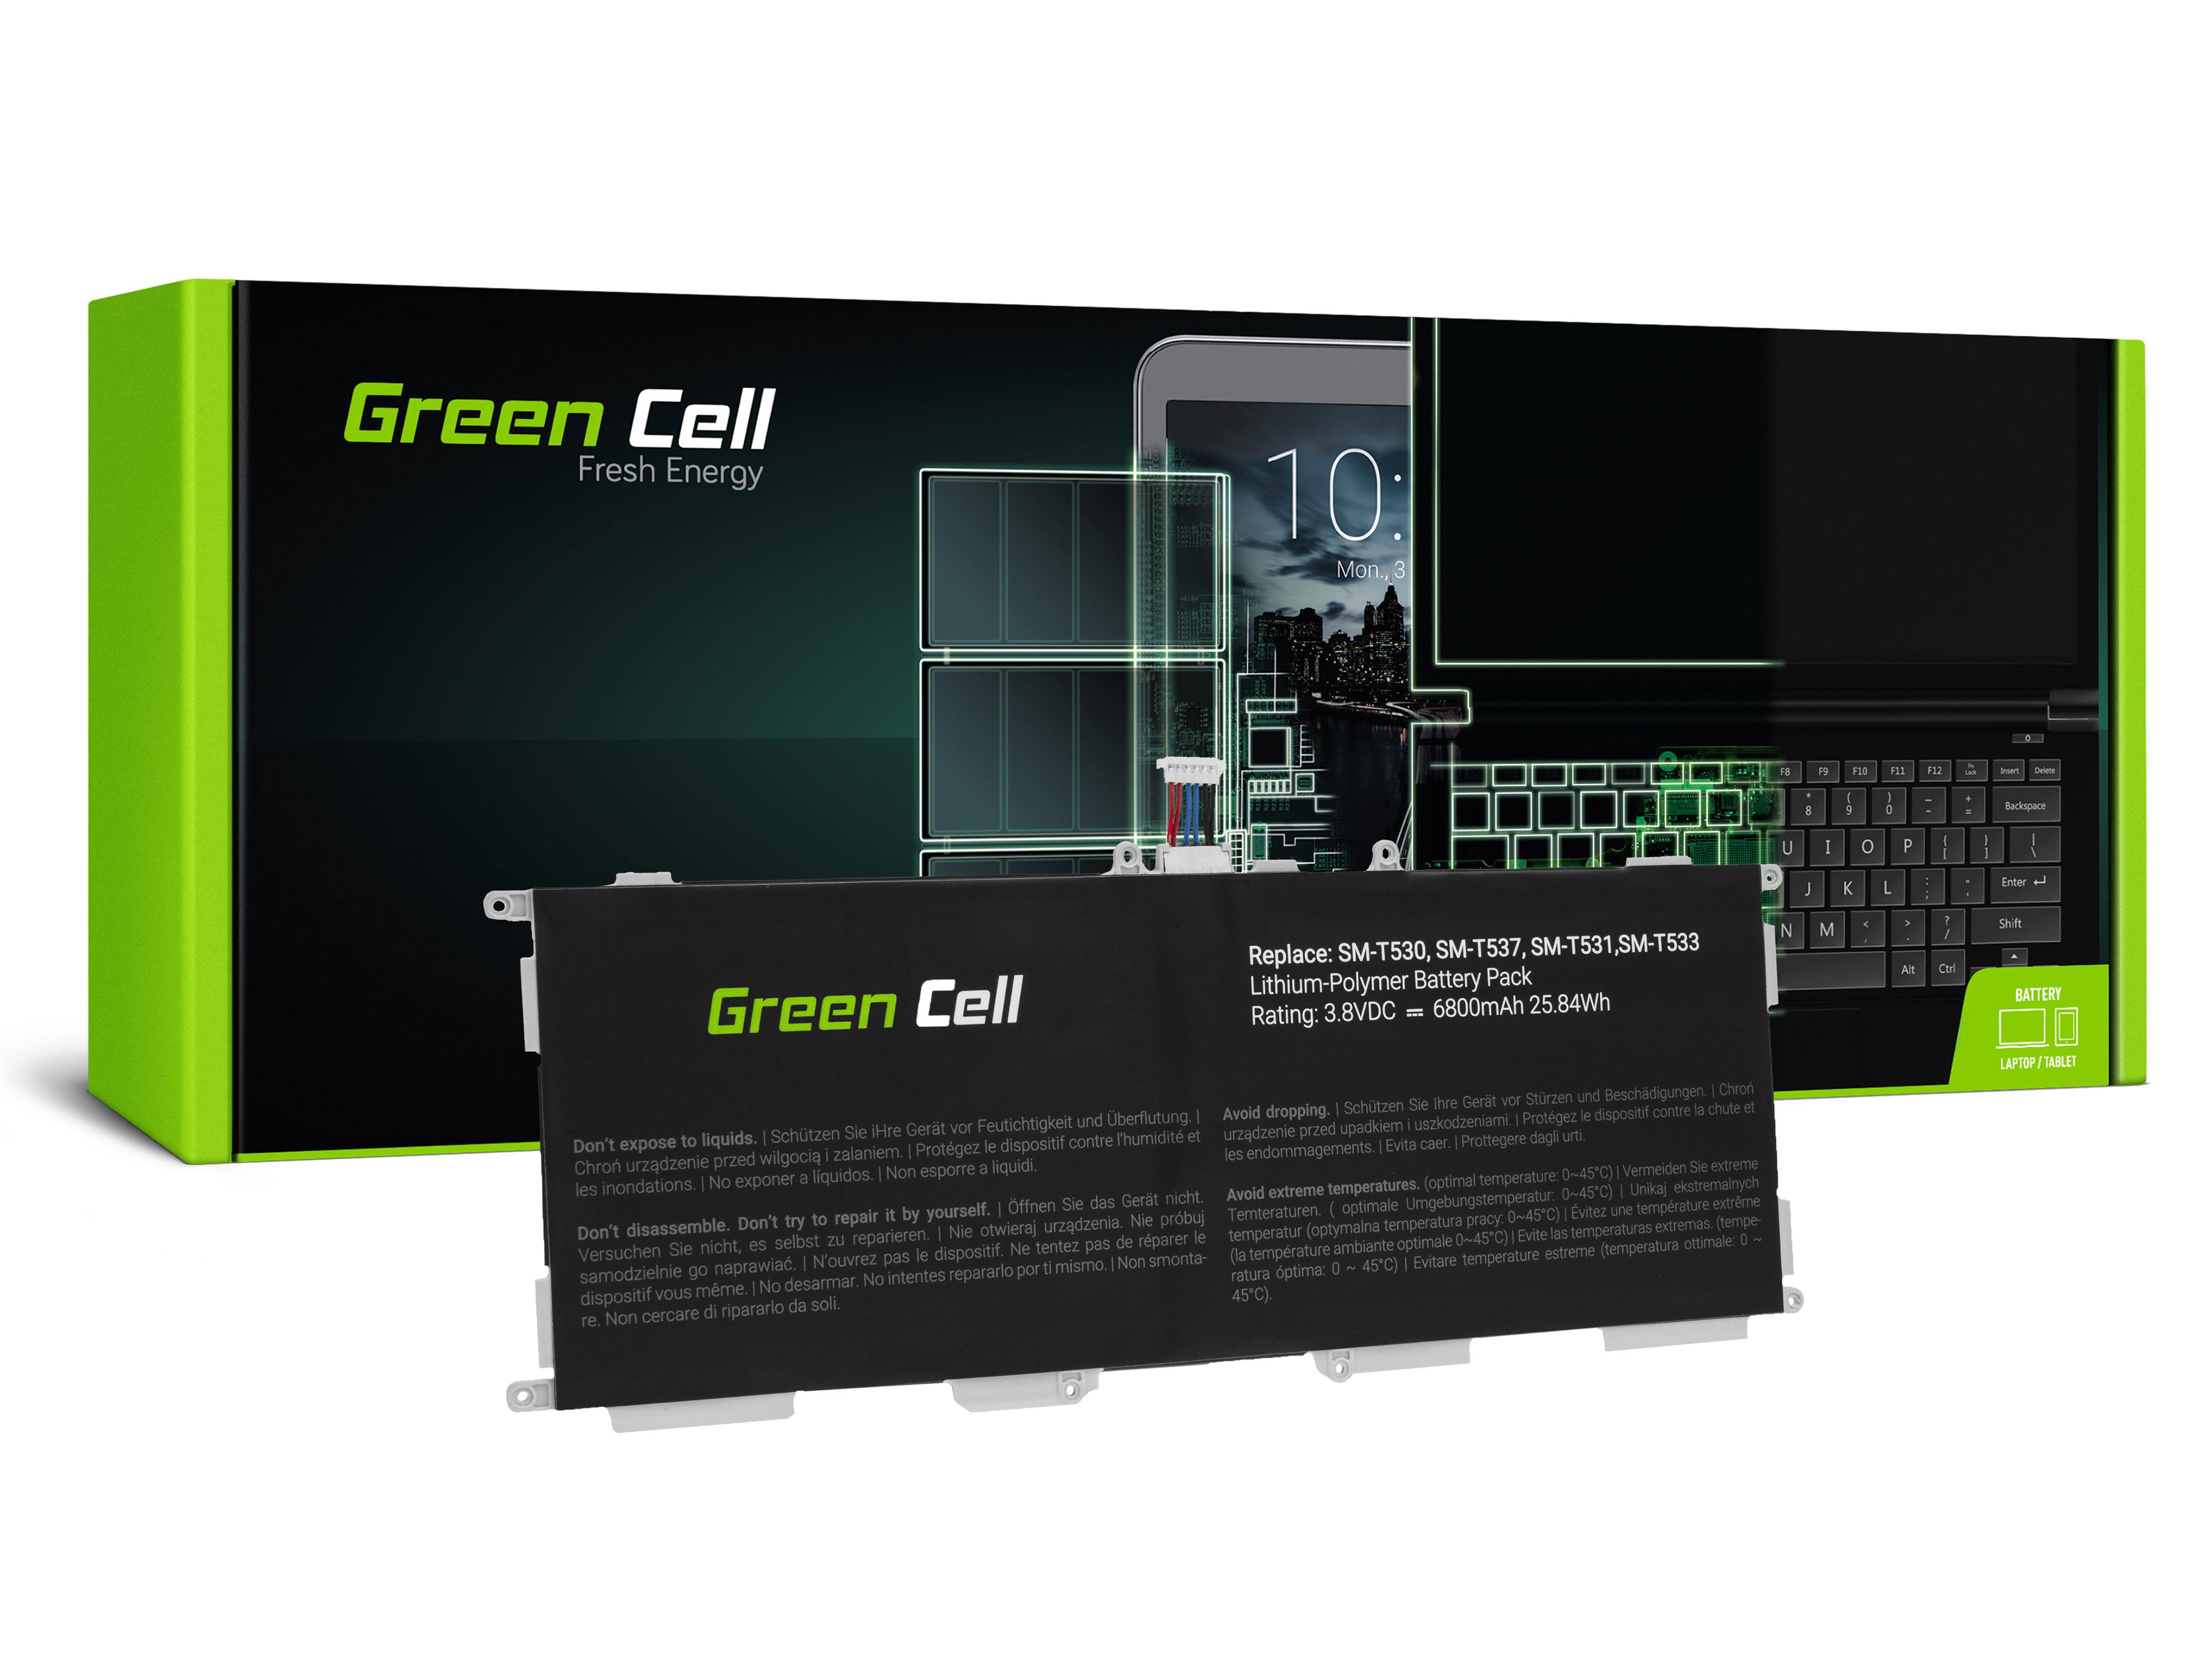 Green Cell TAB40 Baterie Samsung EB-BT530FBE EB-BT530FBU pro Samsung Galaxy Tab 4 10.1 T530 T531 T533 T535 SM-T530 SM-T531 SM-T533 SM-T535 6800mAh Li-Pol – neoriginální